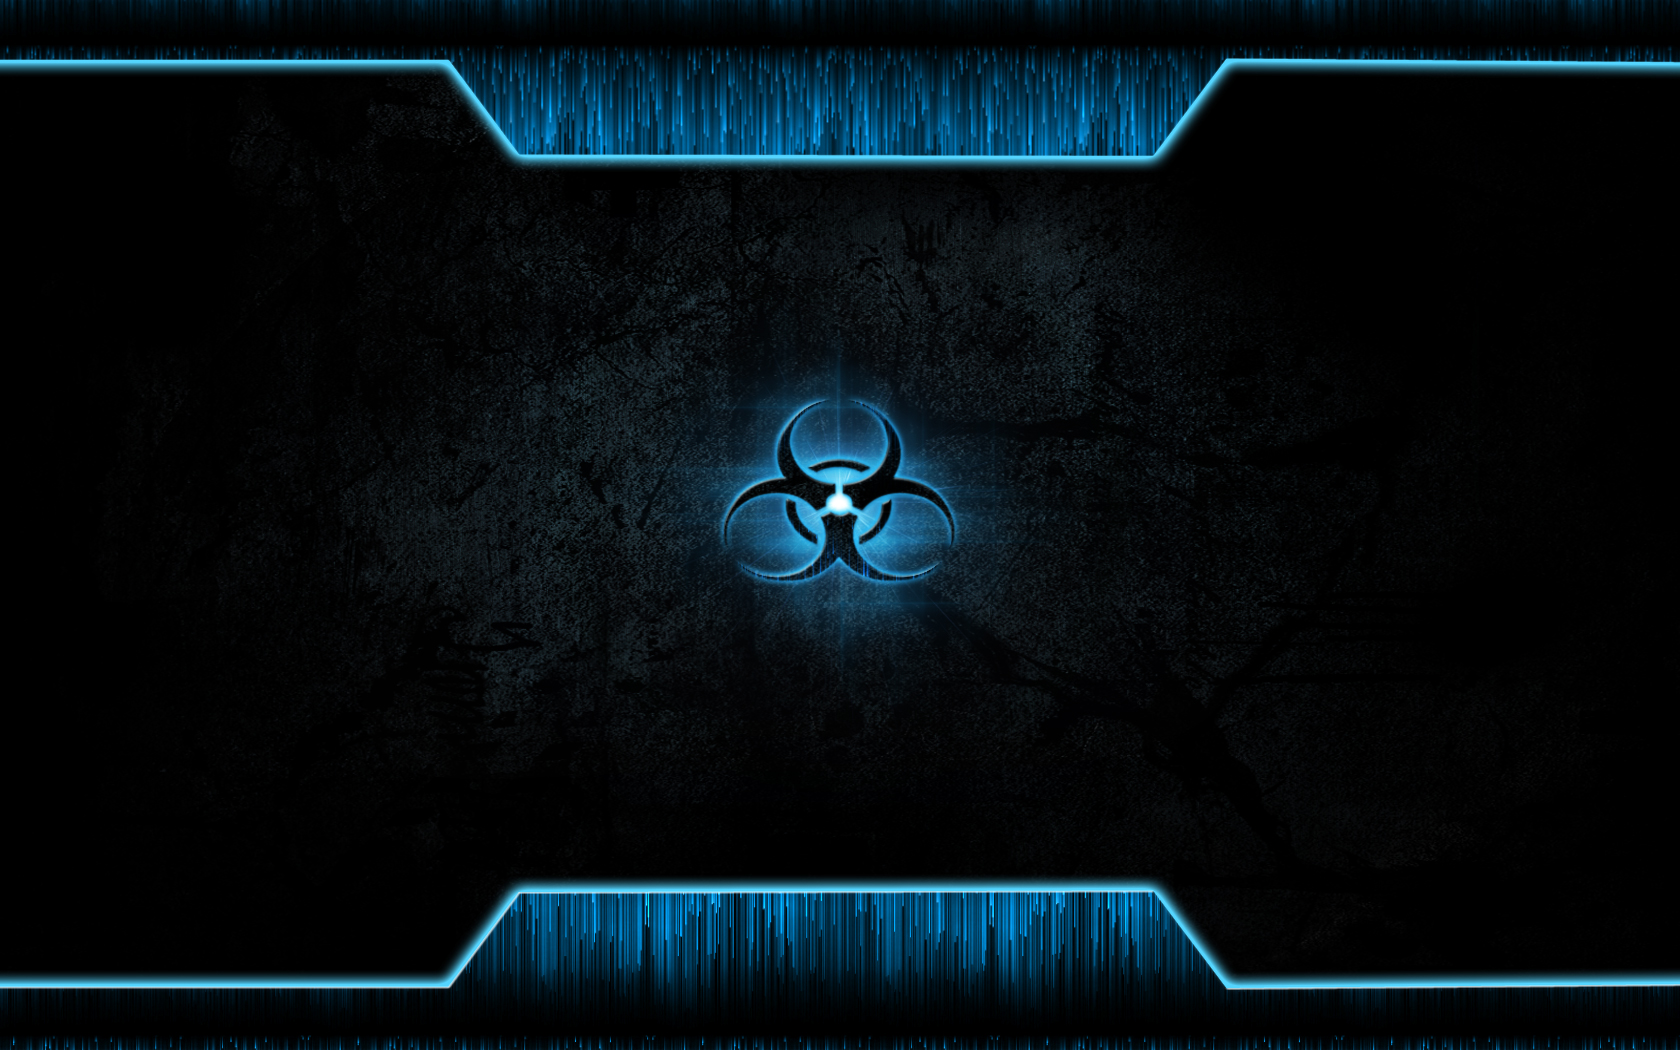 Biohazard wallpaper by N-3-k-Y on DeviantArt